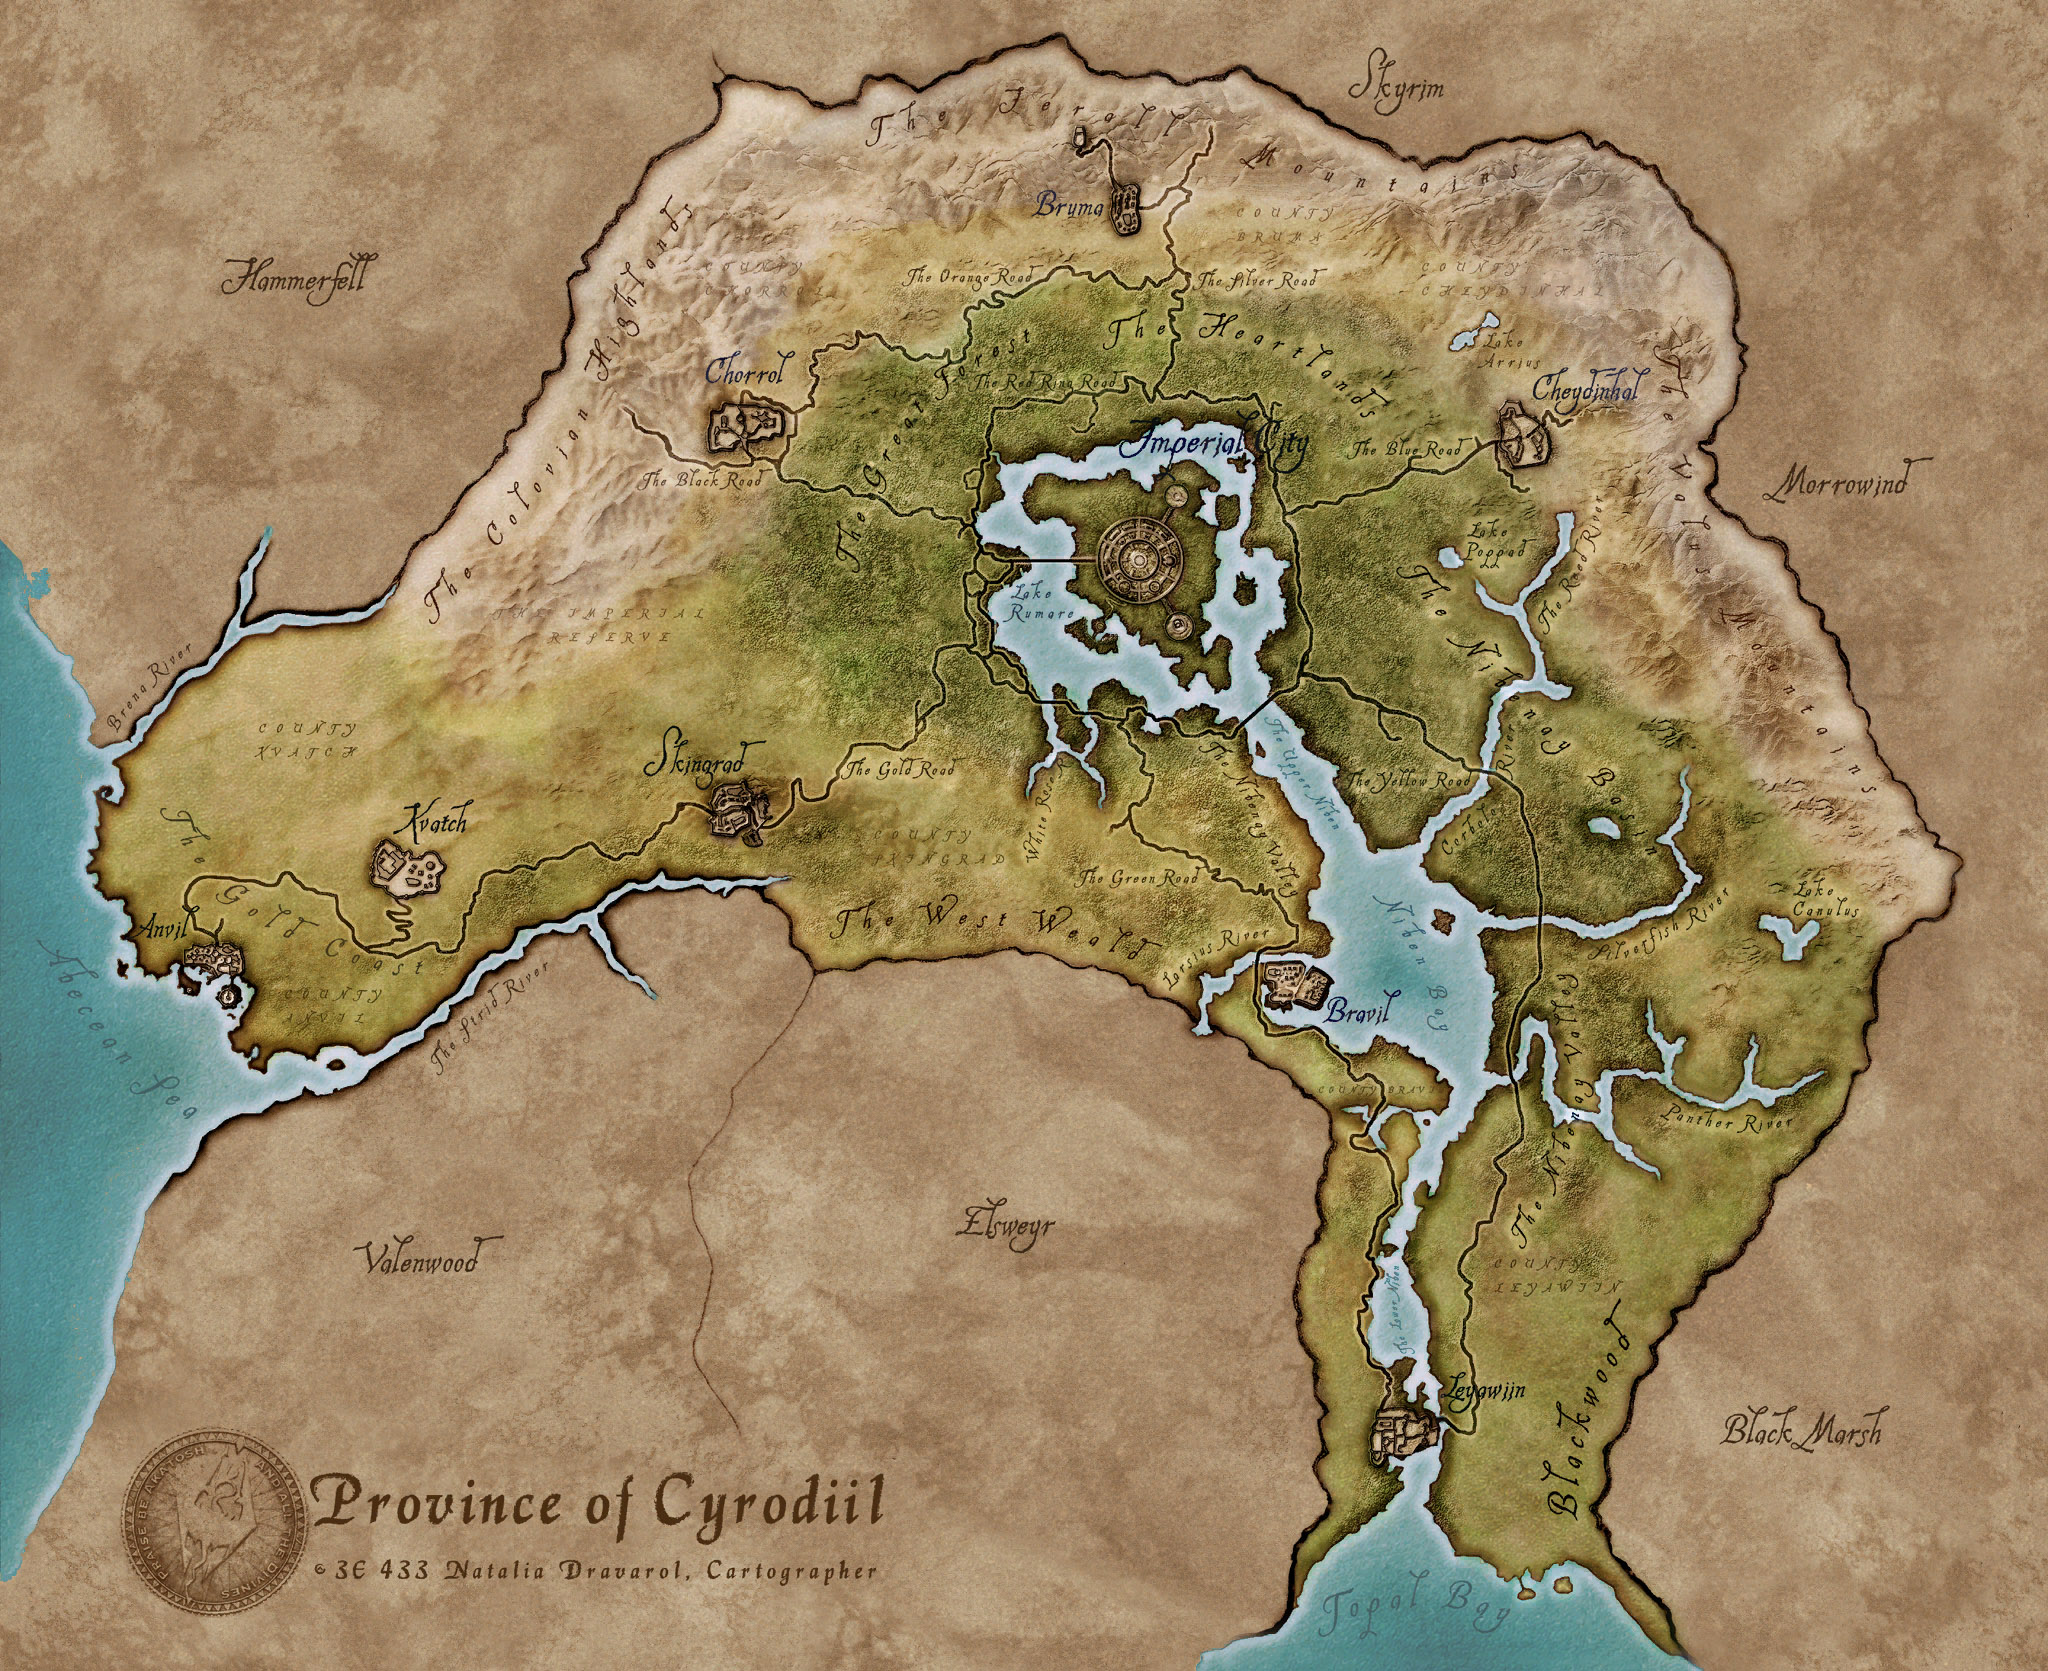 Oblivion Elder Scrolls World Map